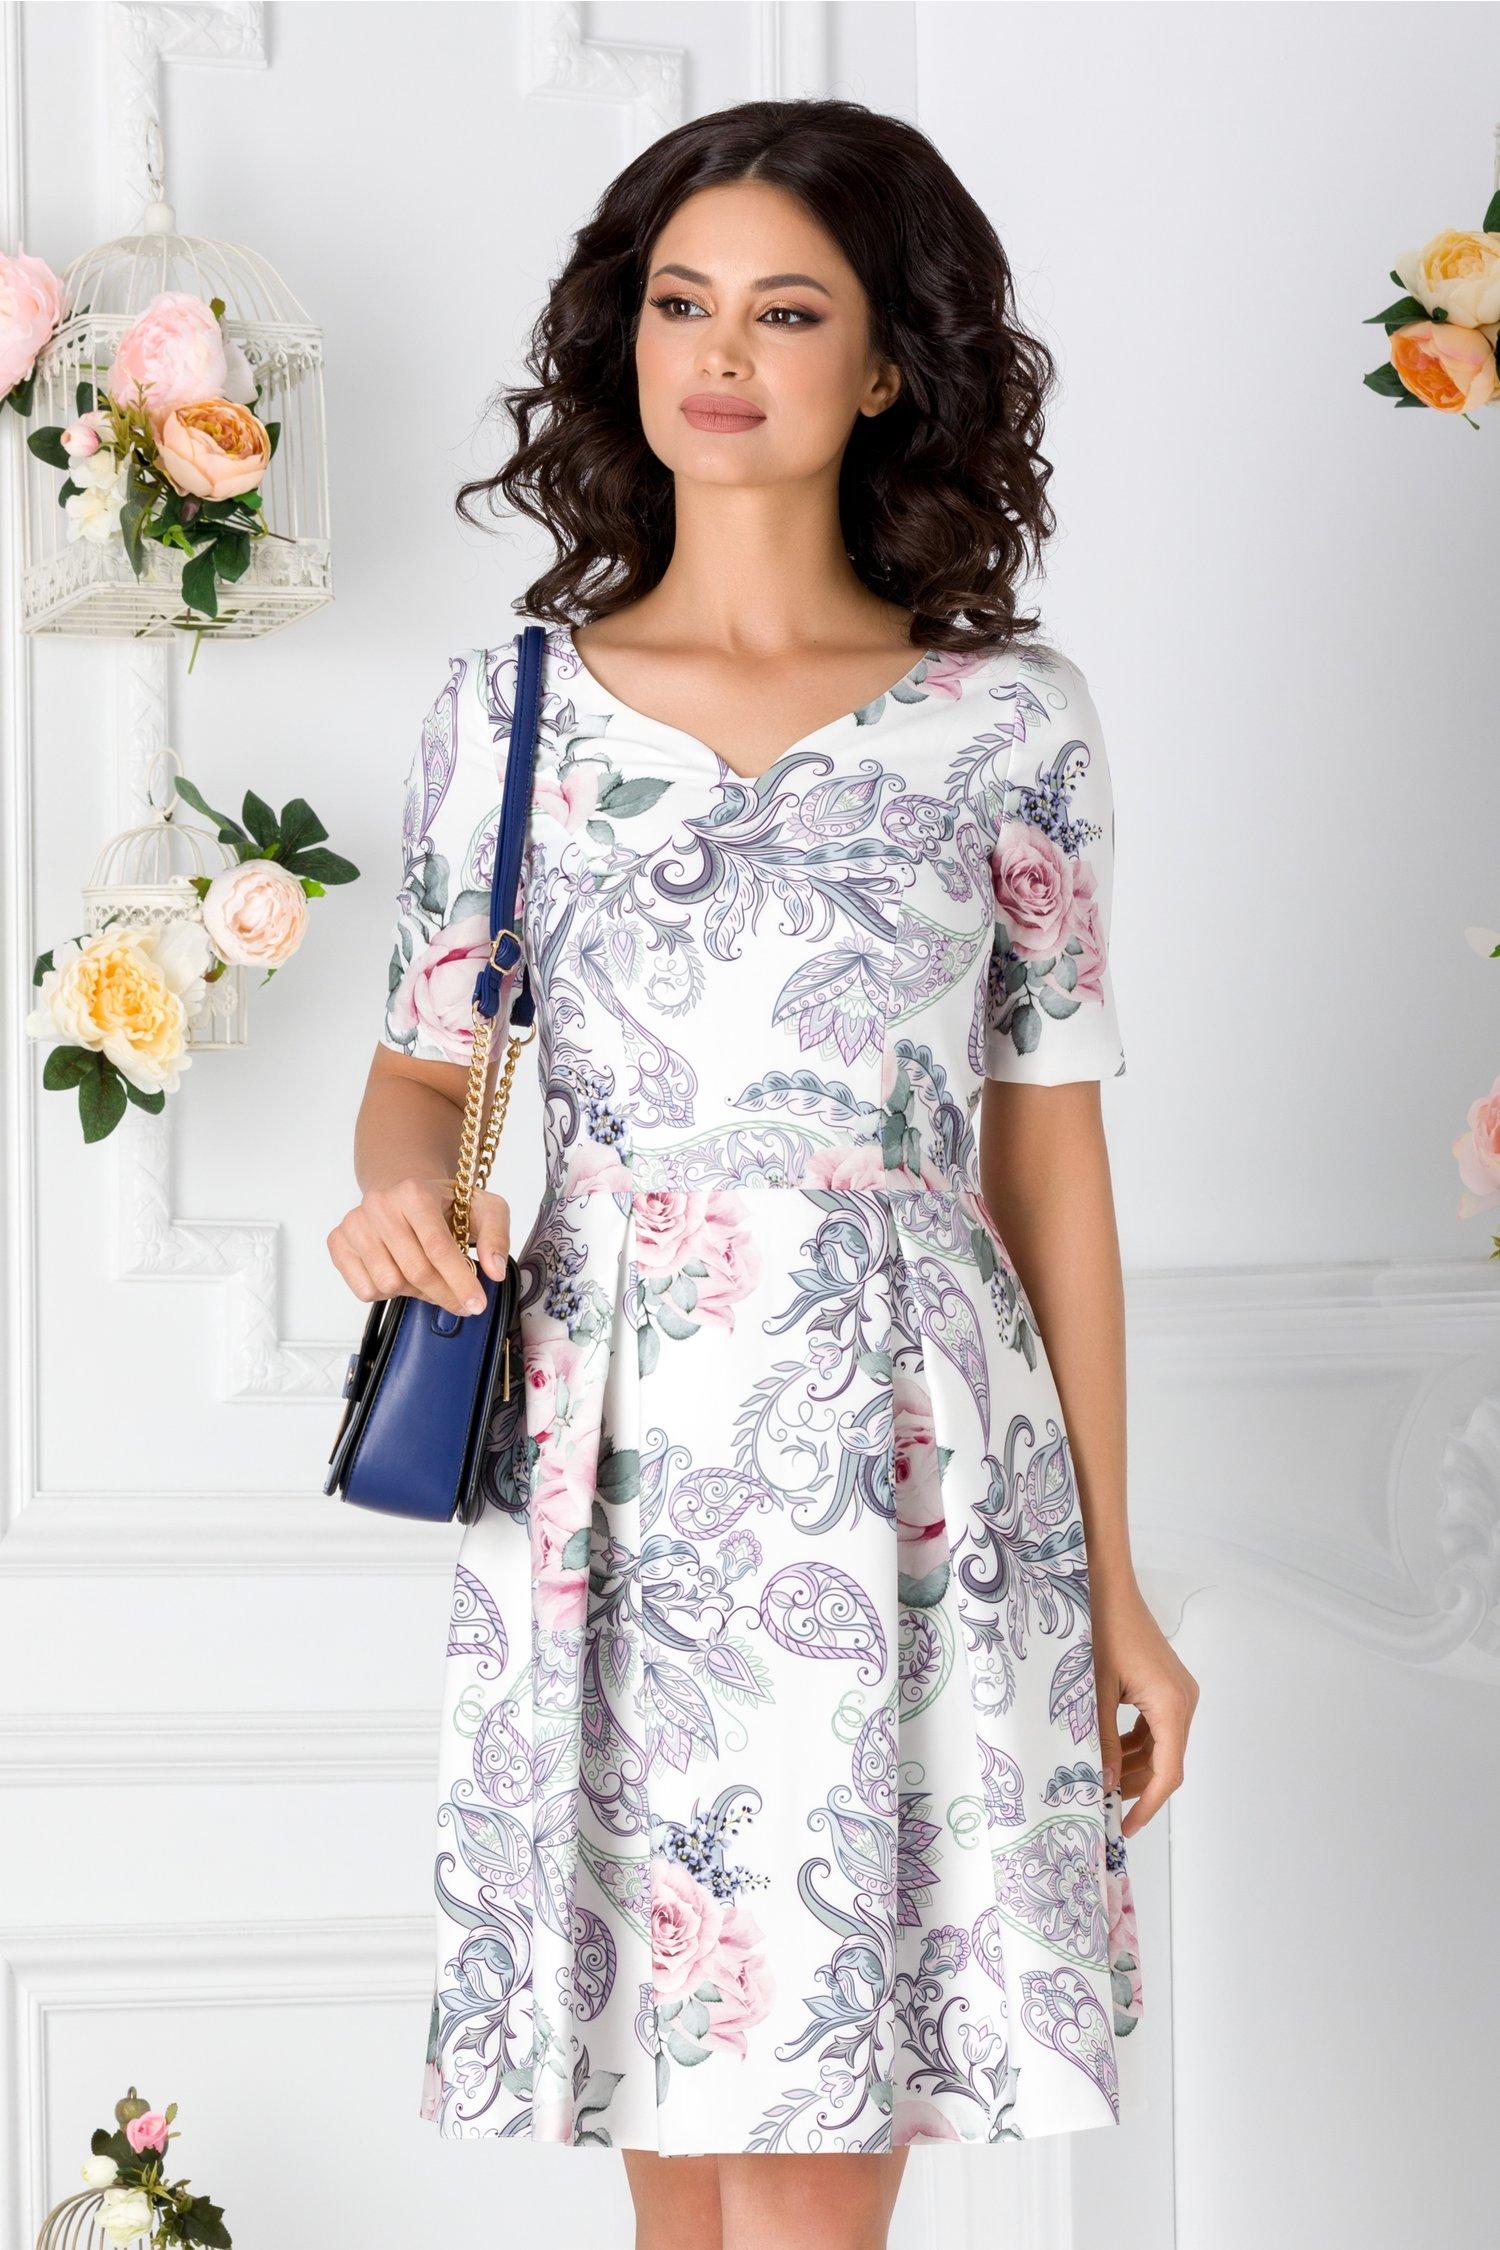 Rochie Myra alba cu imprimeu floral pastelat